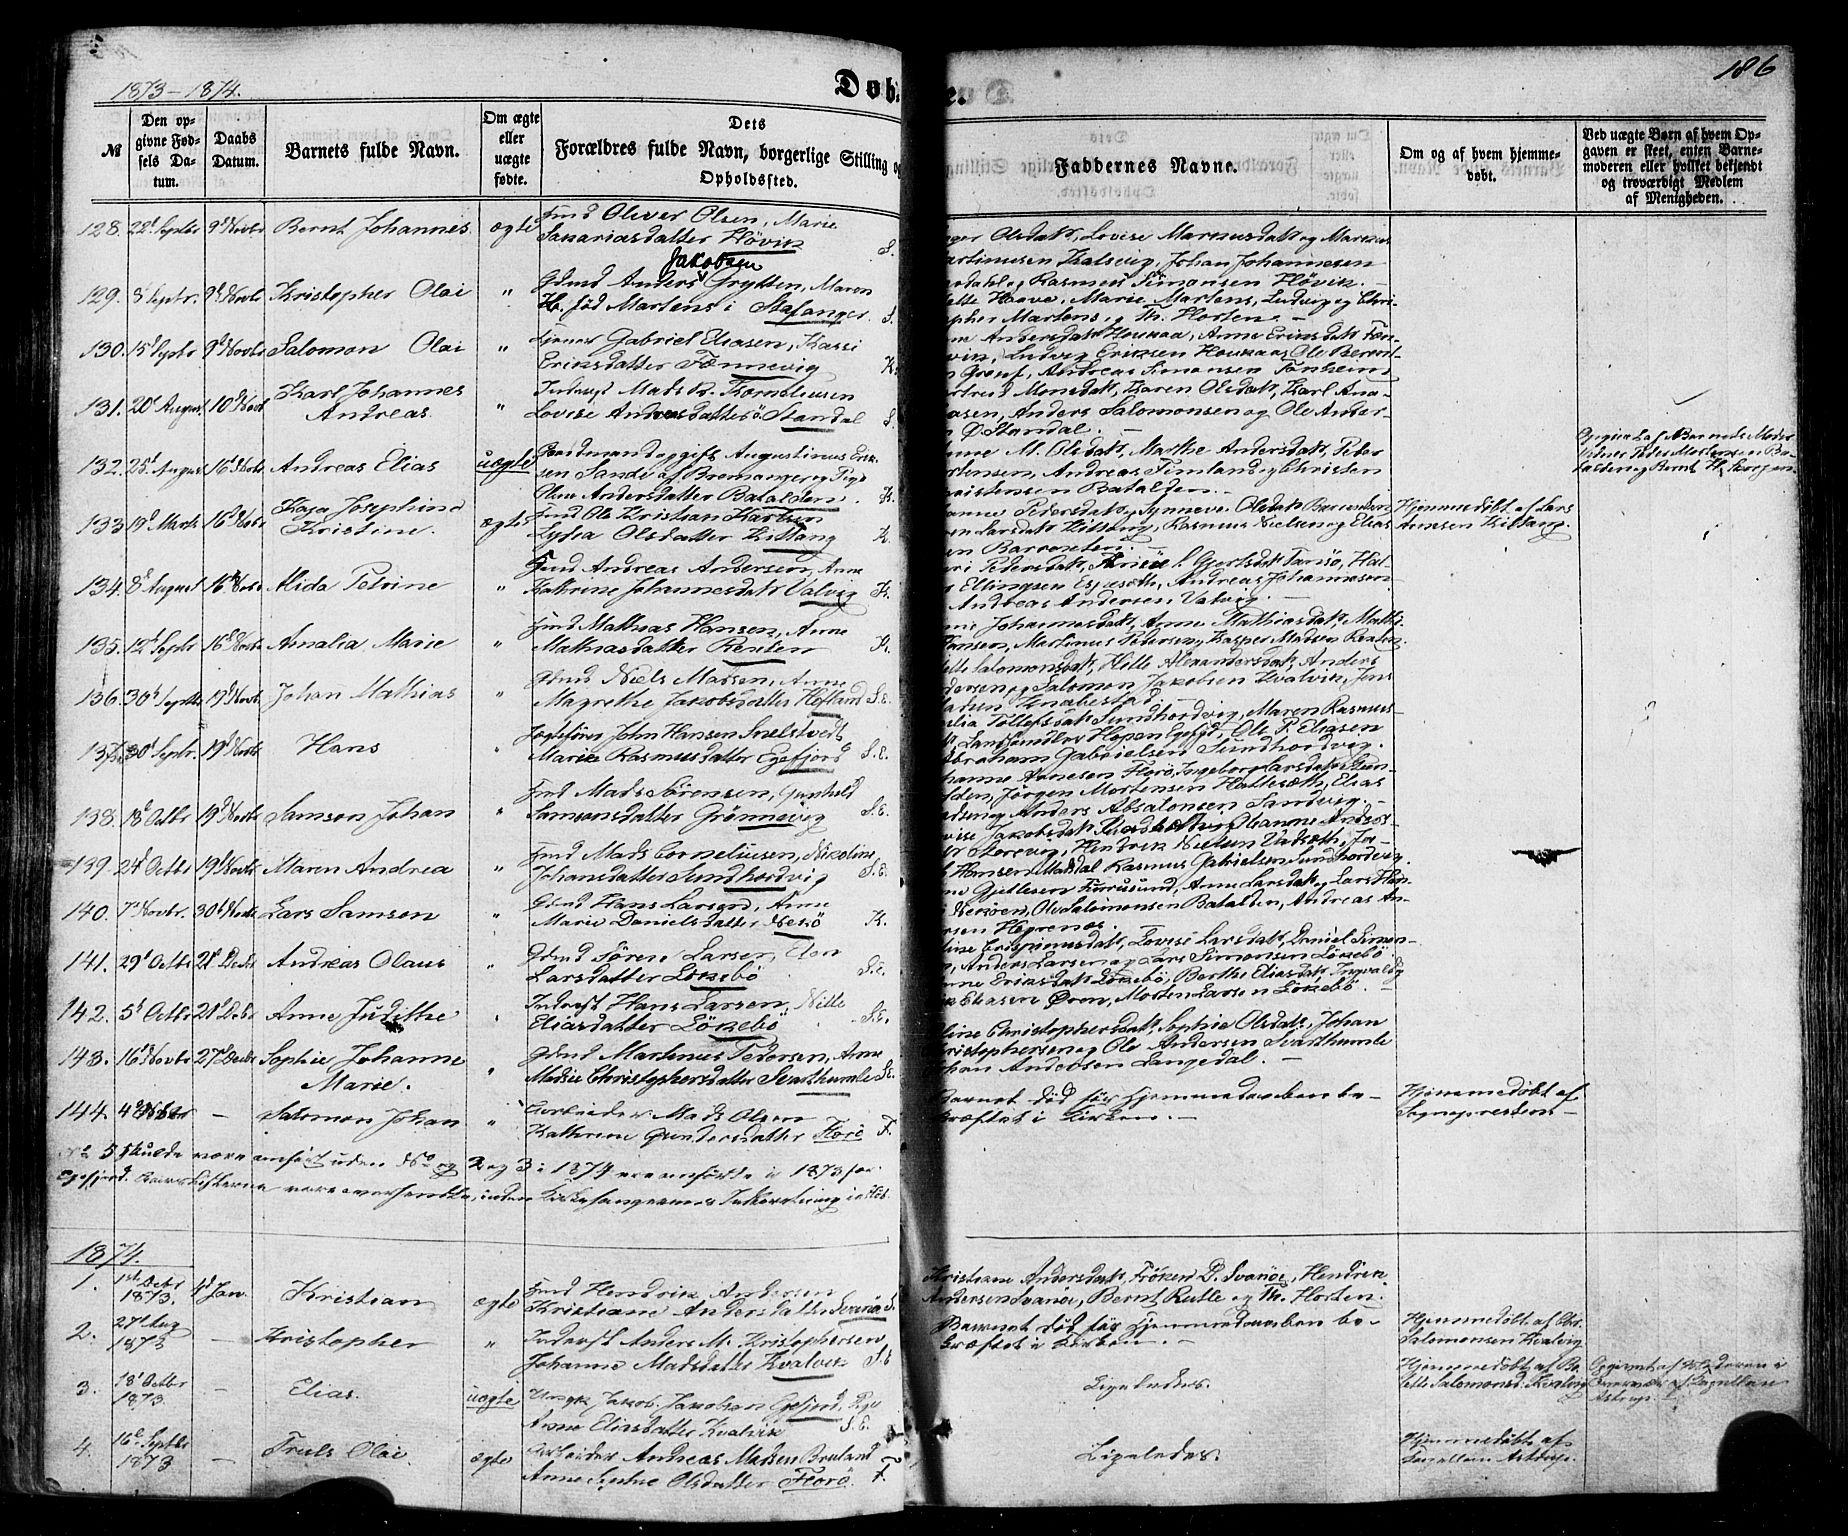 SAB, Kinn sokneprestembete, H/Haa/Haaa/L0006: Parish register (official) no. A 6, 1857-1885, p. 186